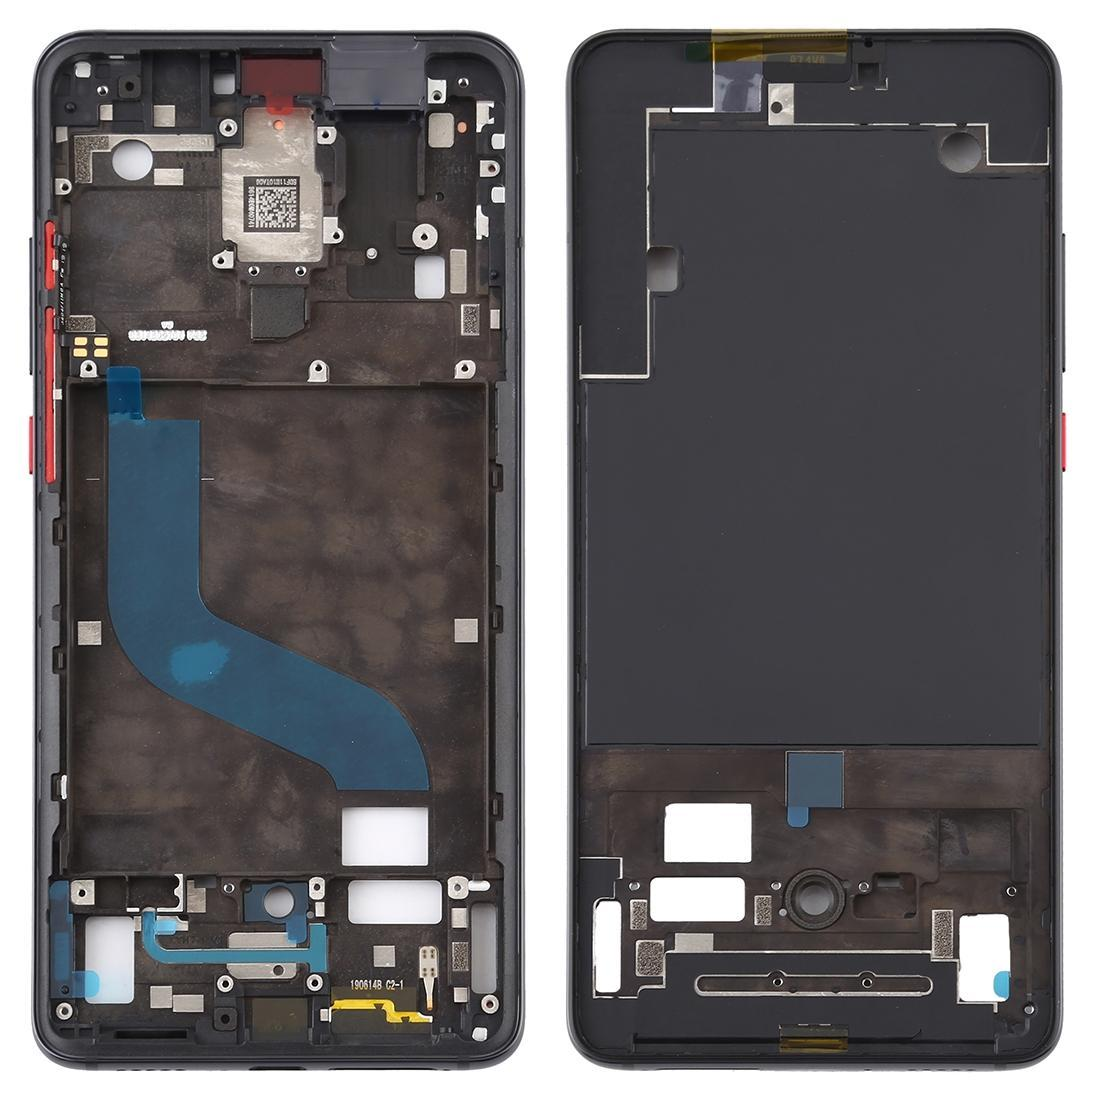 Fronte Housing LCD Telaio Bezel Piastra per Xiaomi redmi K20 K20 redmi Pro Mi 9T Mi 9T Pro